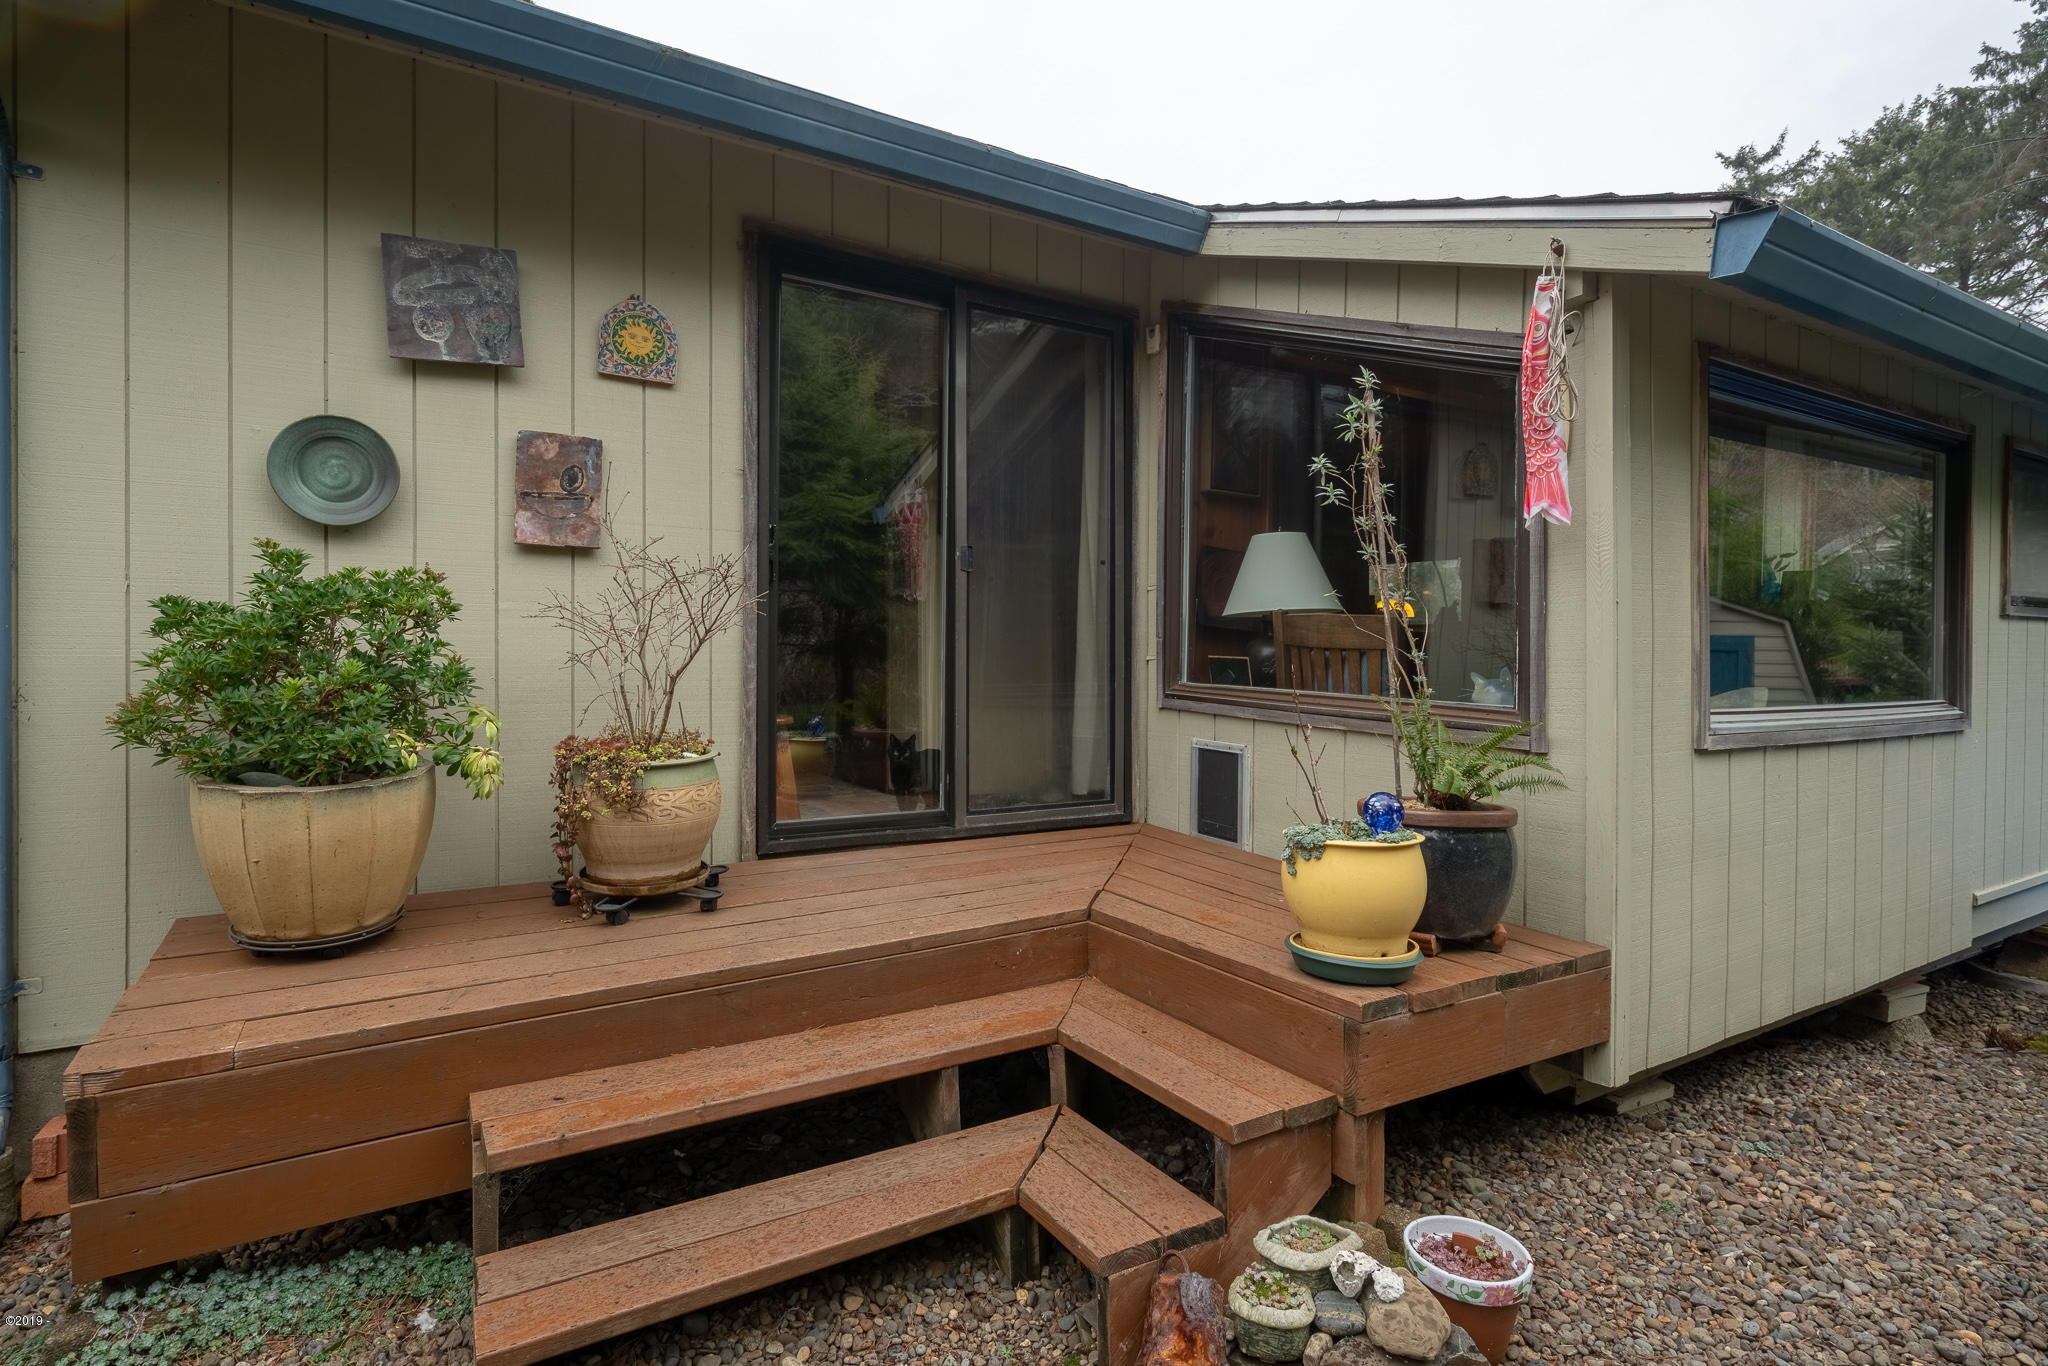 4490 Blue Heron Way, Neskowin, OR 97149 - Exterior of home